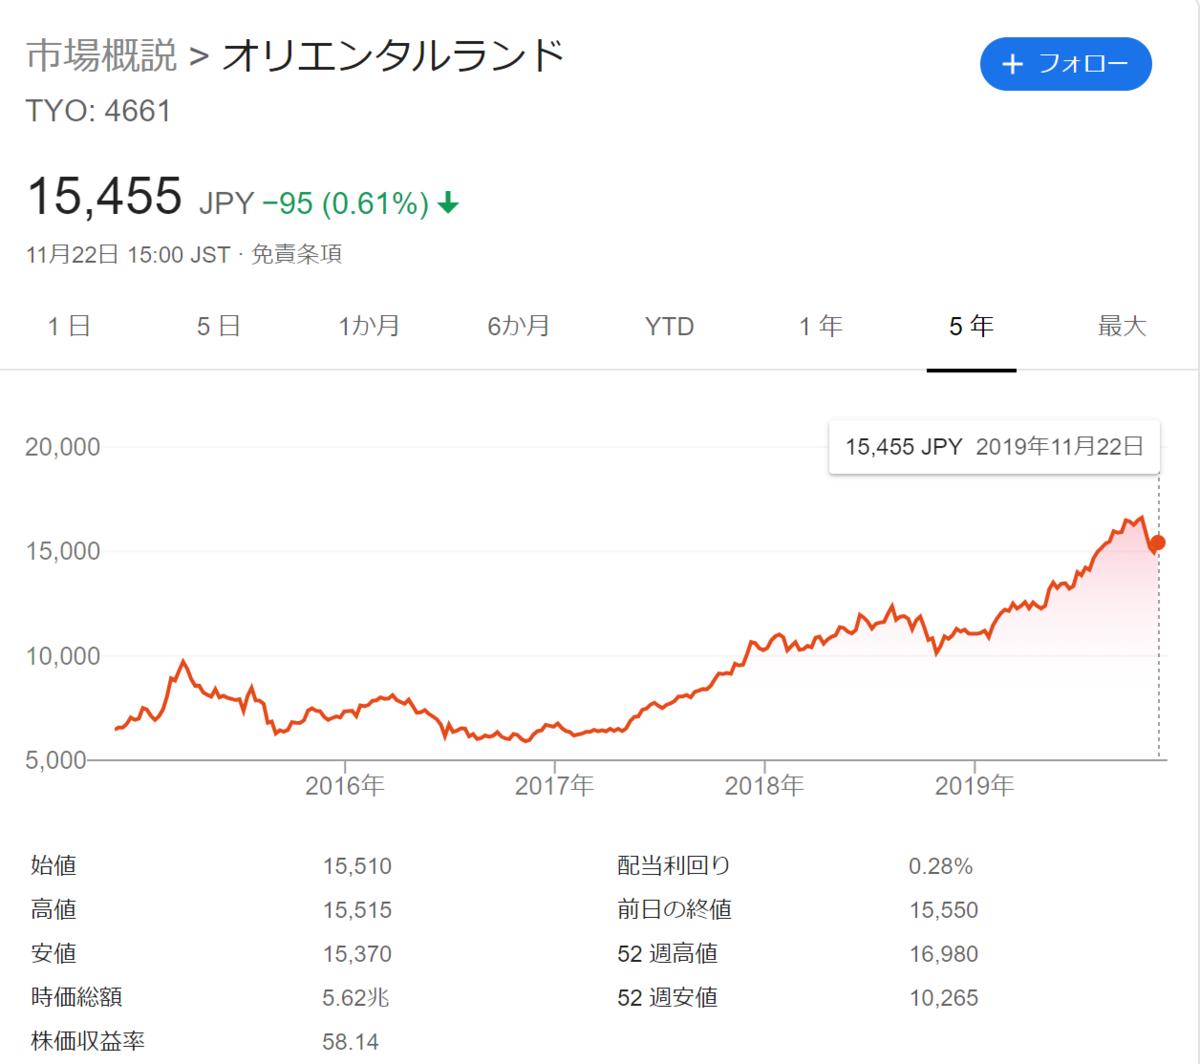 f:id:Investor-neko:20191122232641p:plain